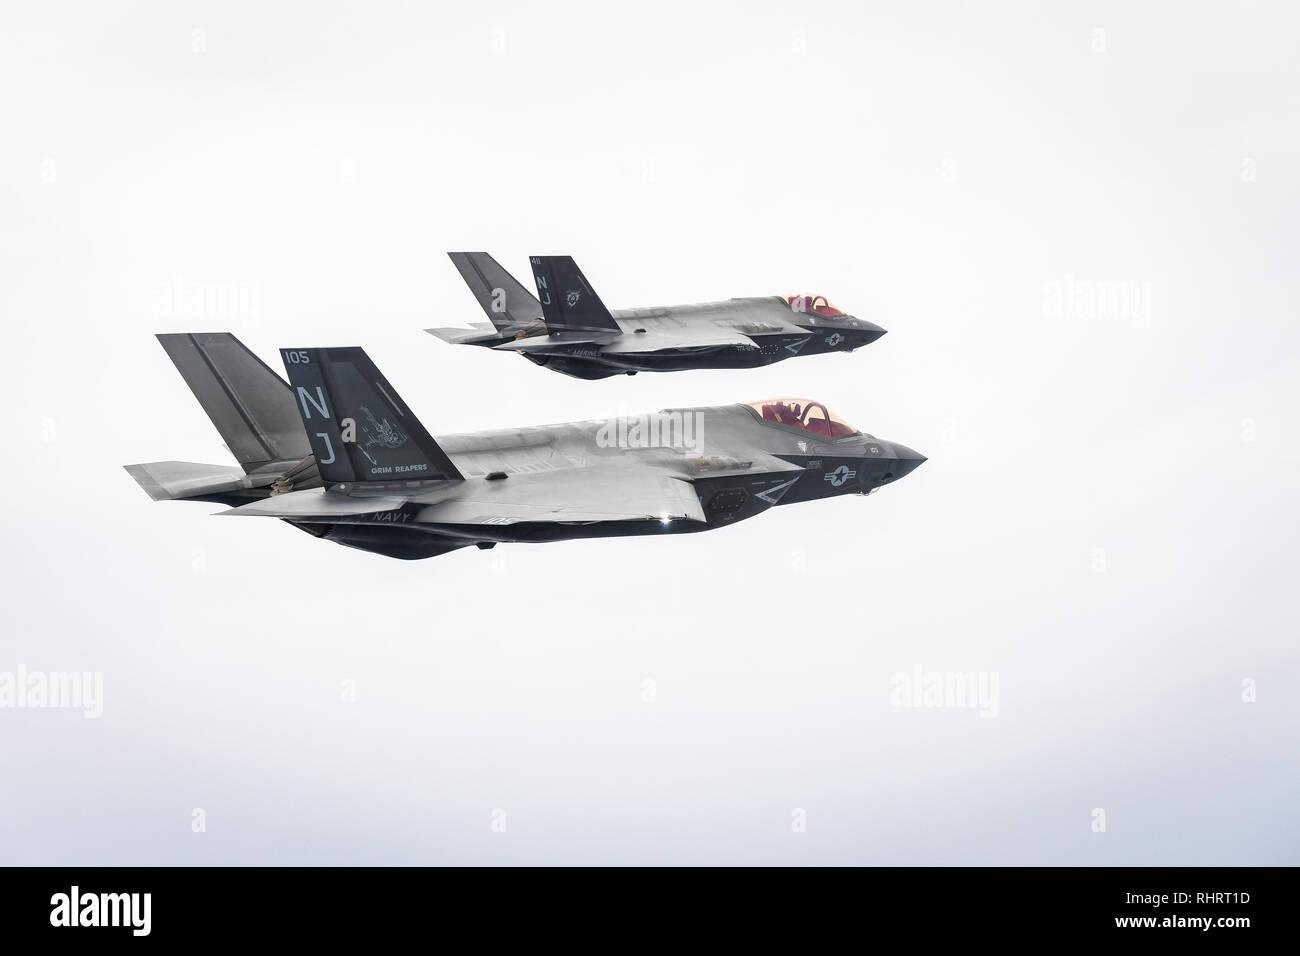 EGLIN AIR FORCE BASE, Fla  (Feb  1, 2019) Two F-35C